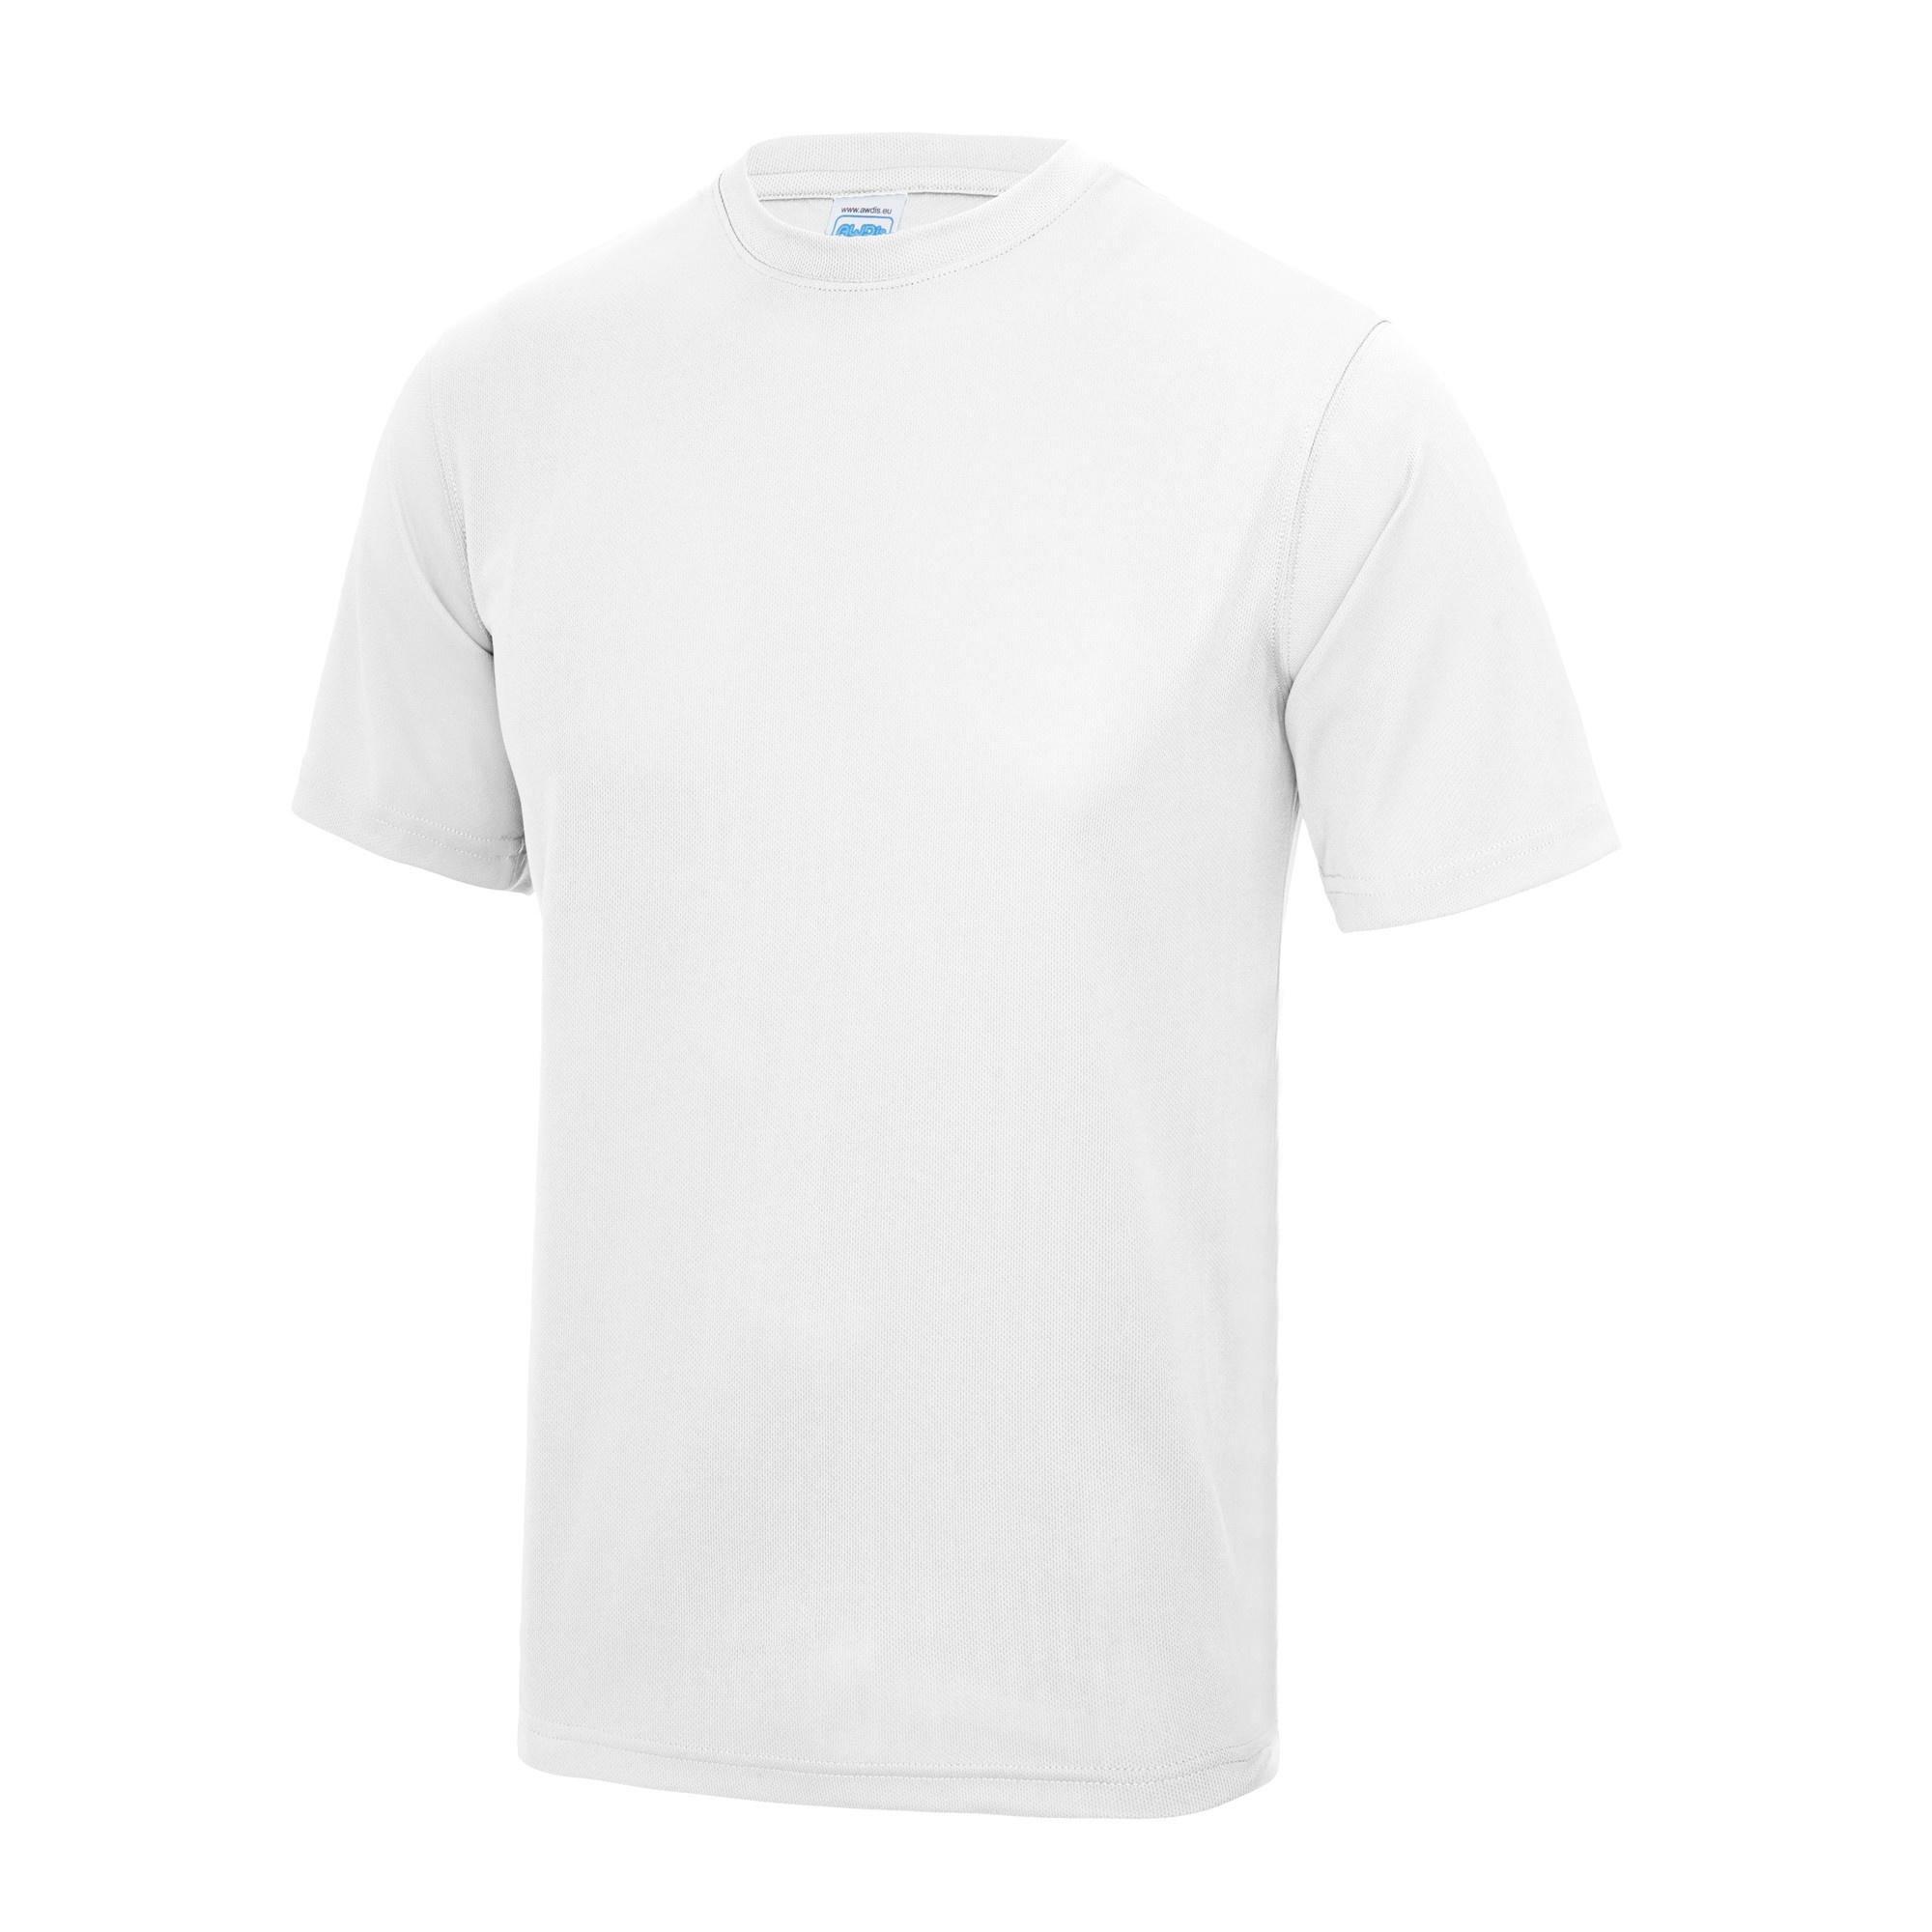 Adults Blind Guide Runner Cool T Shirt